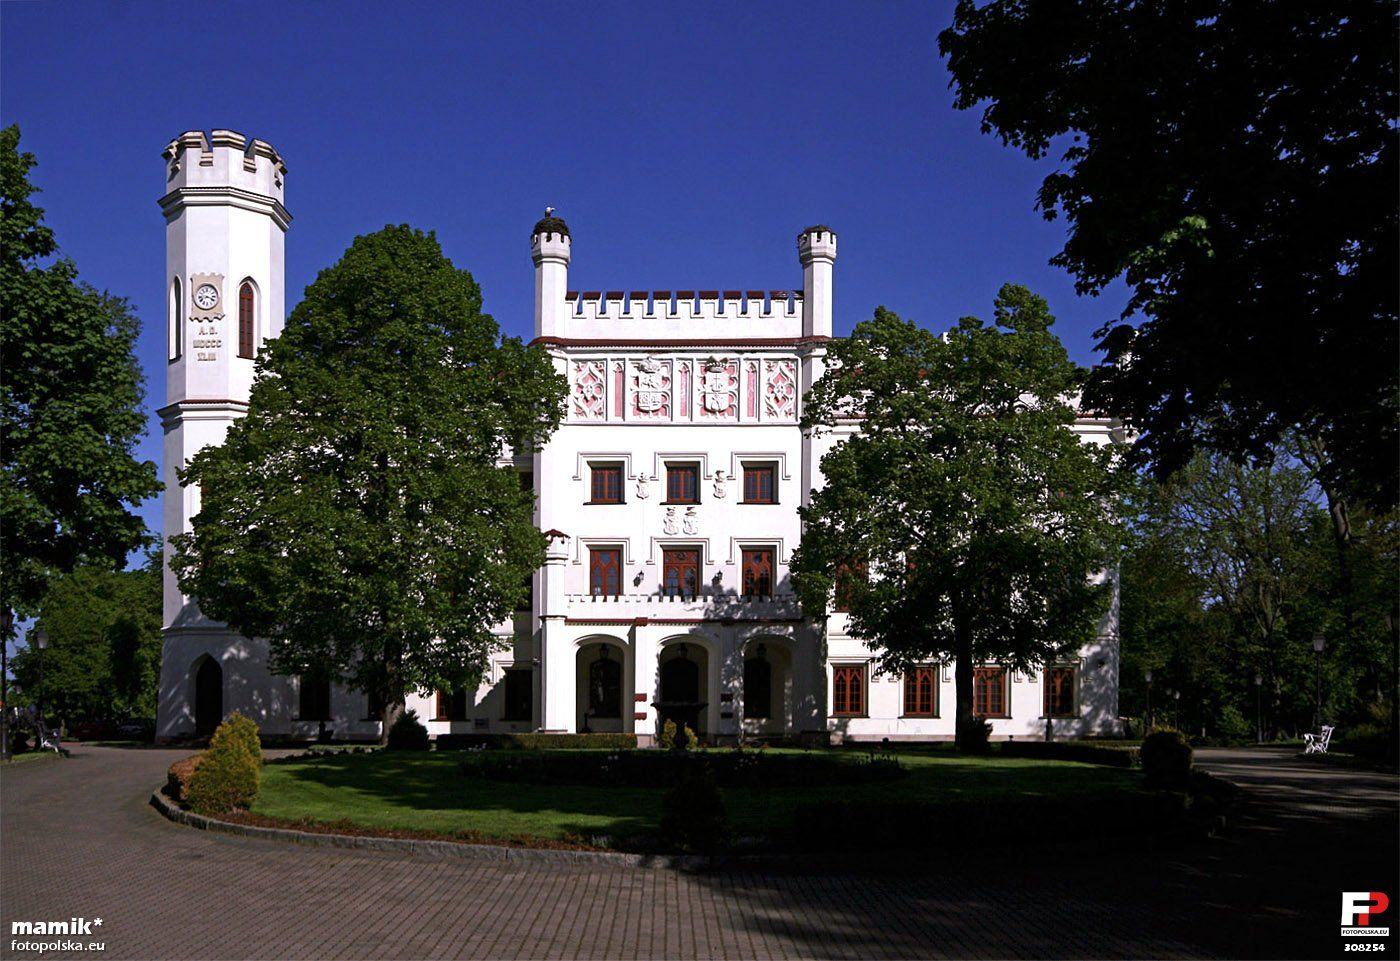 Zamek w Starej Wsi (Polska)